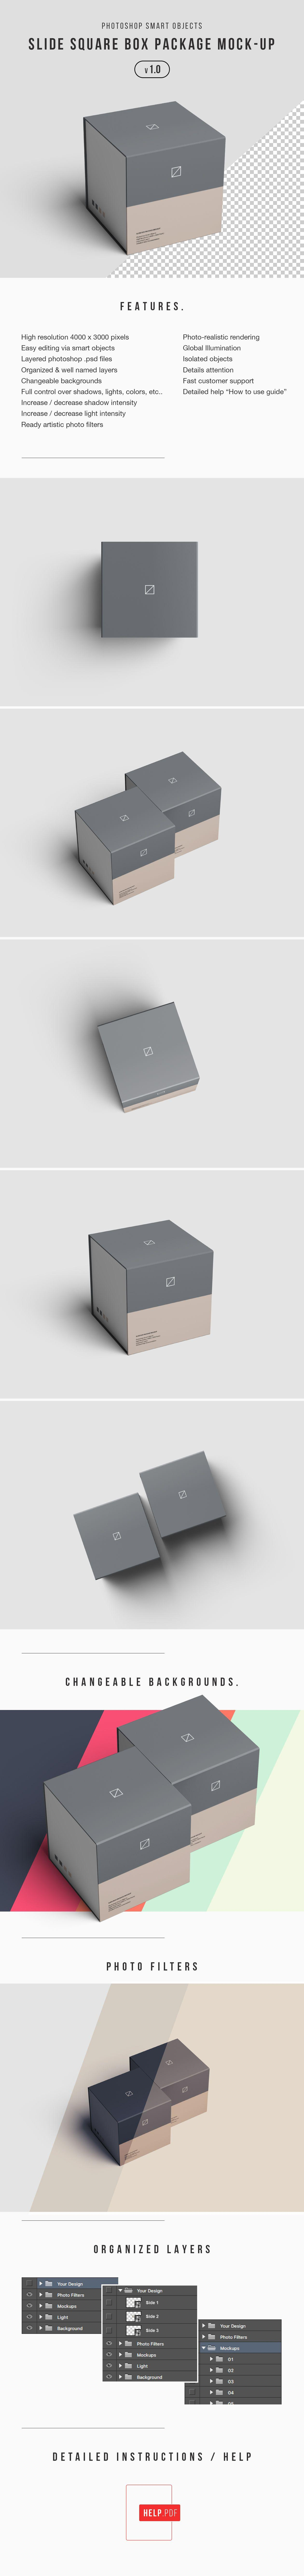 Download Package Box Mockup Slide Box Box Packaging Mockup